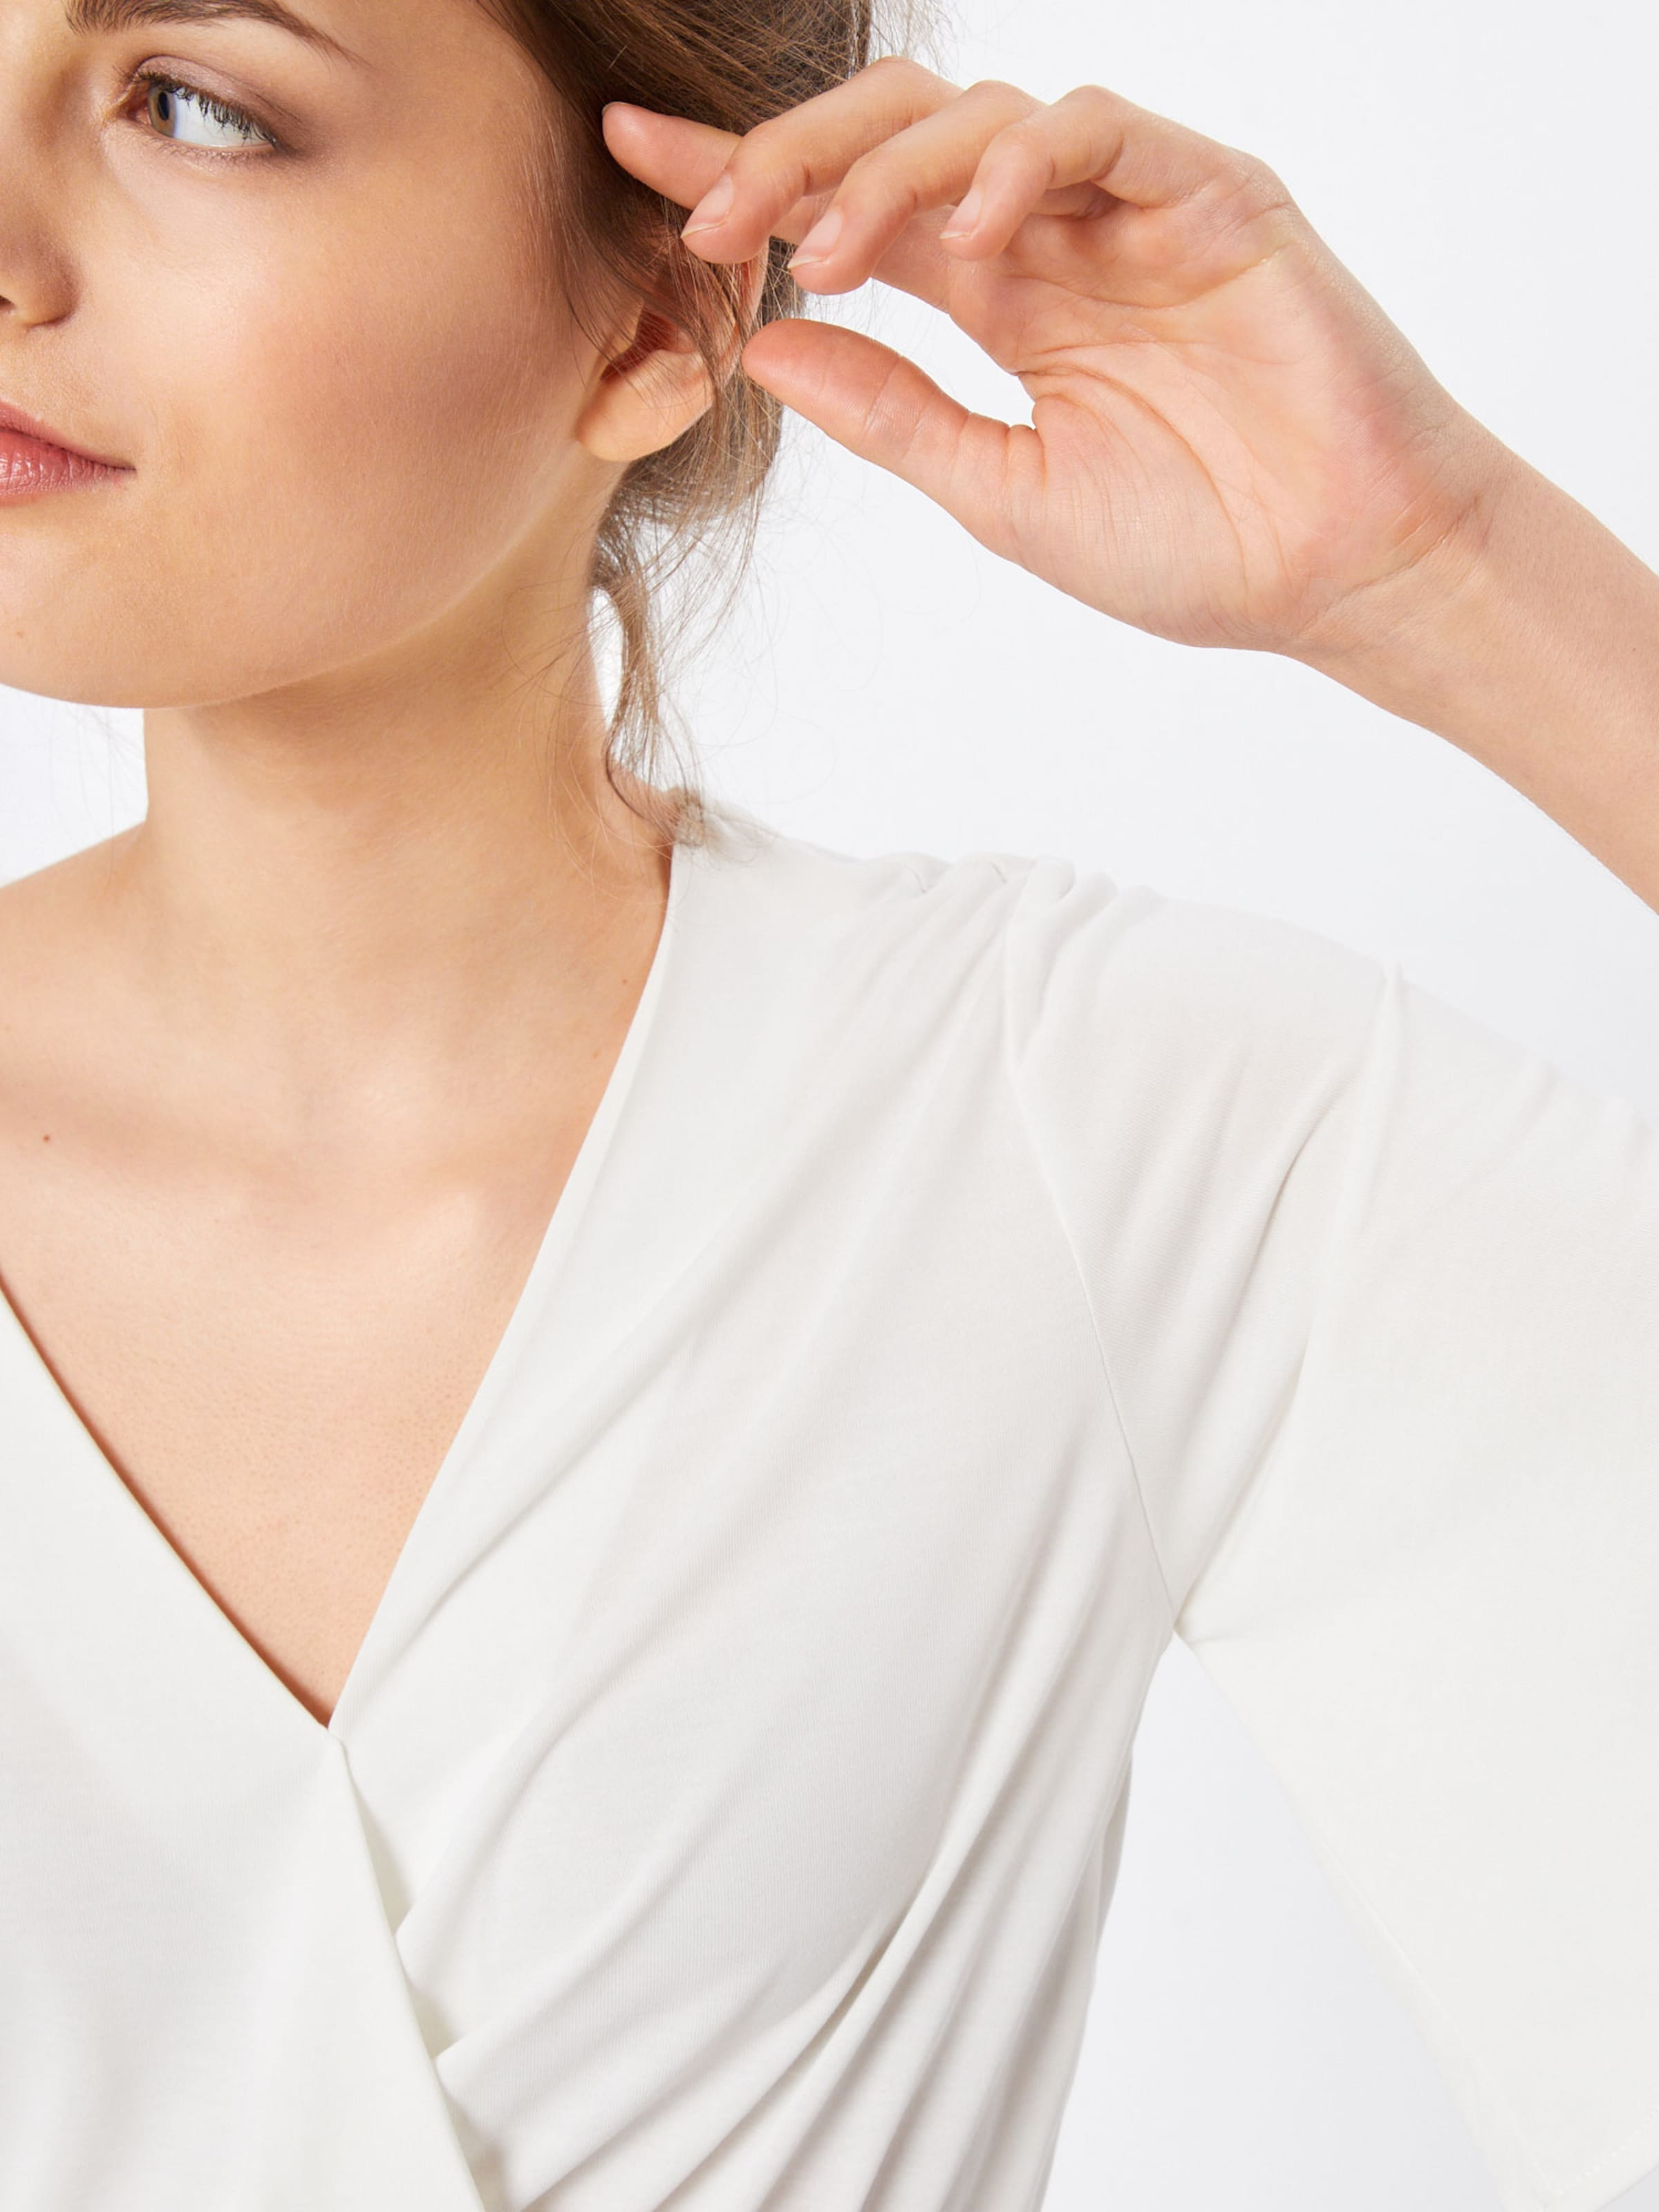 Shirt Noisy Wit In 'tyllia' May x5qwRBqZ4Y